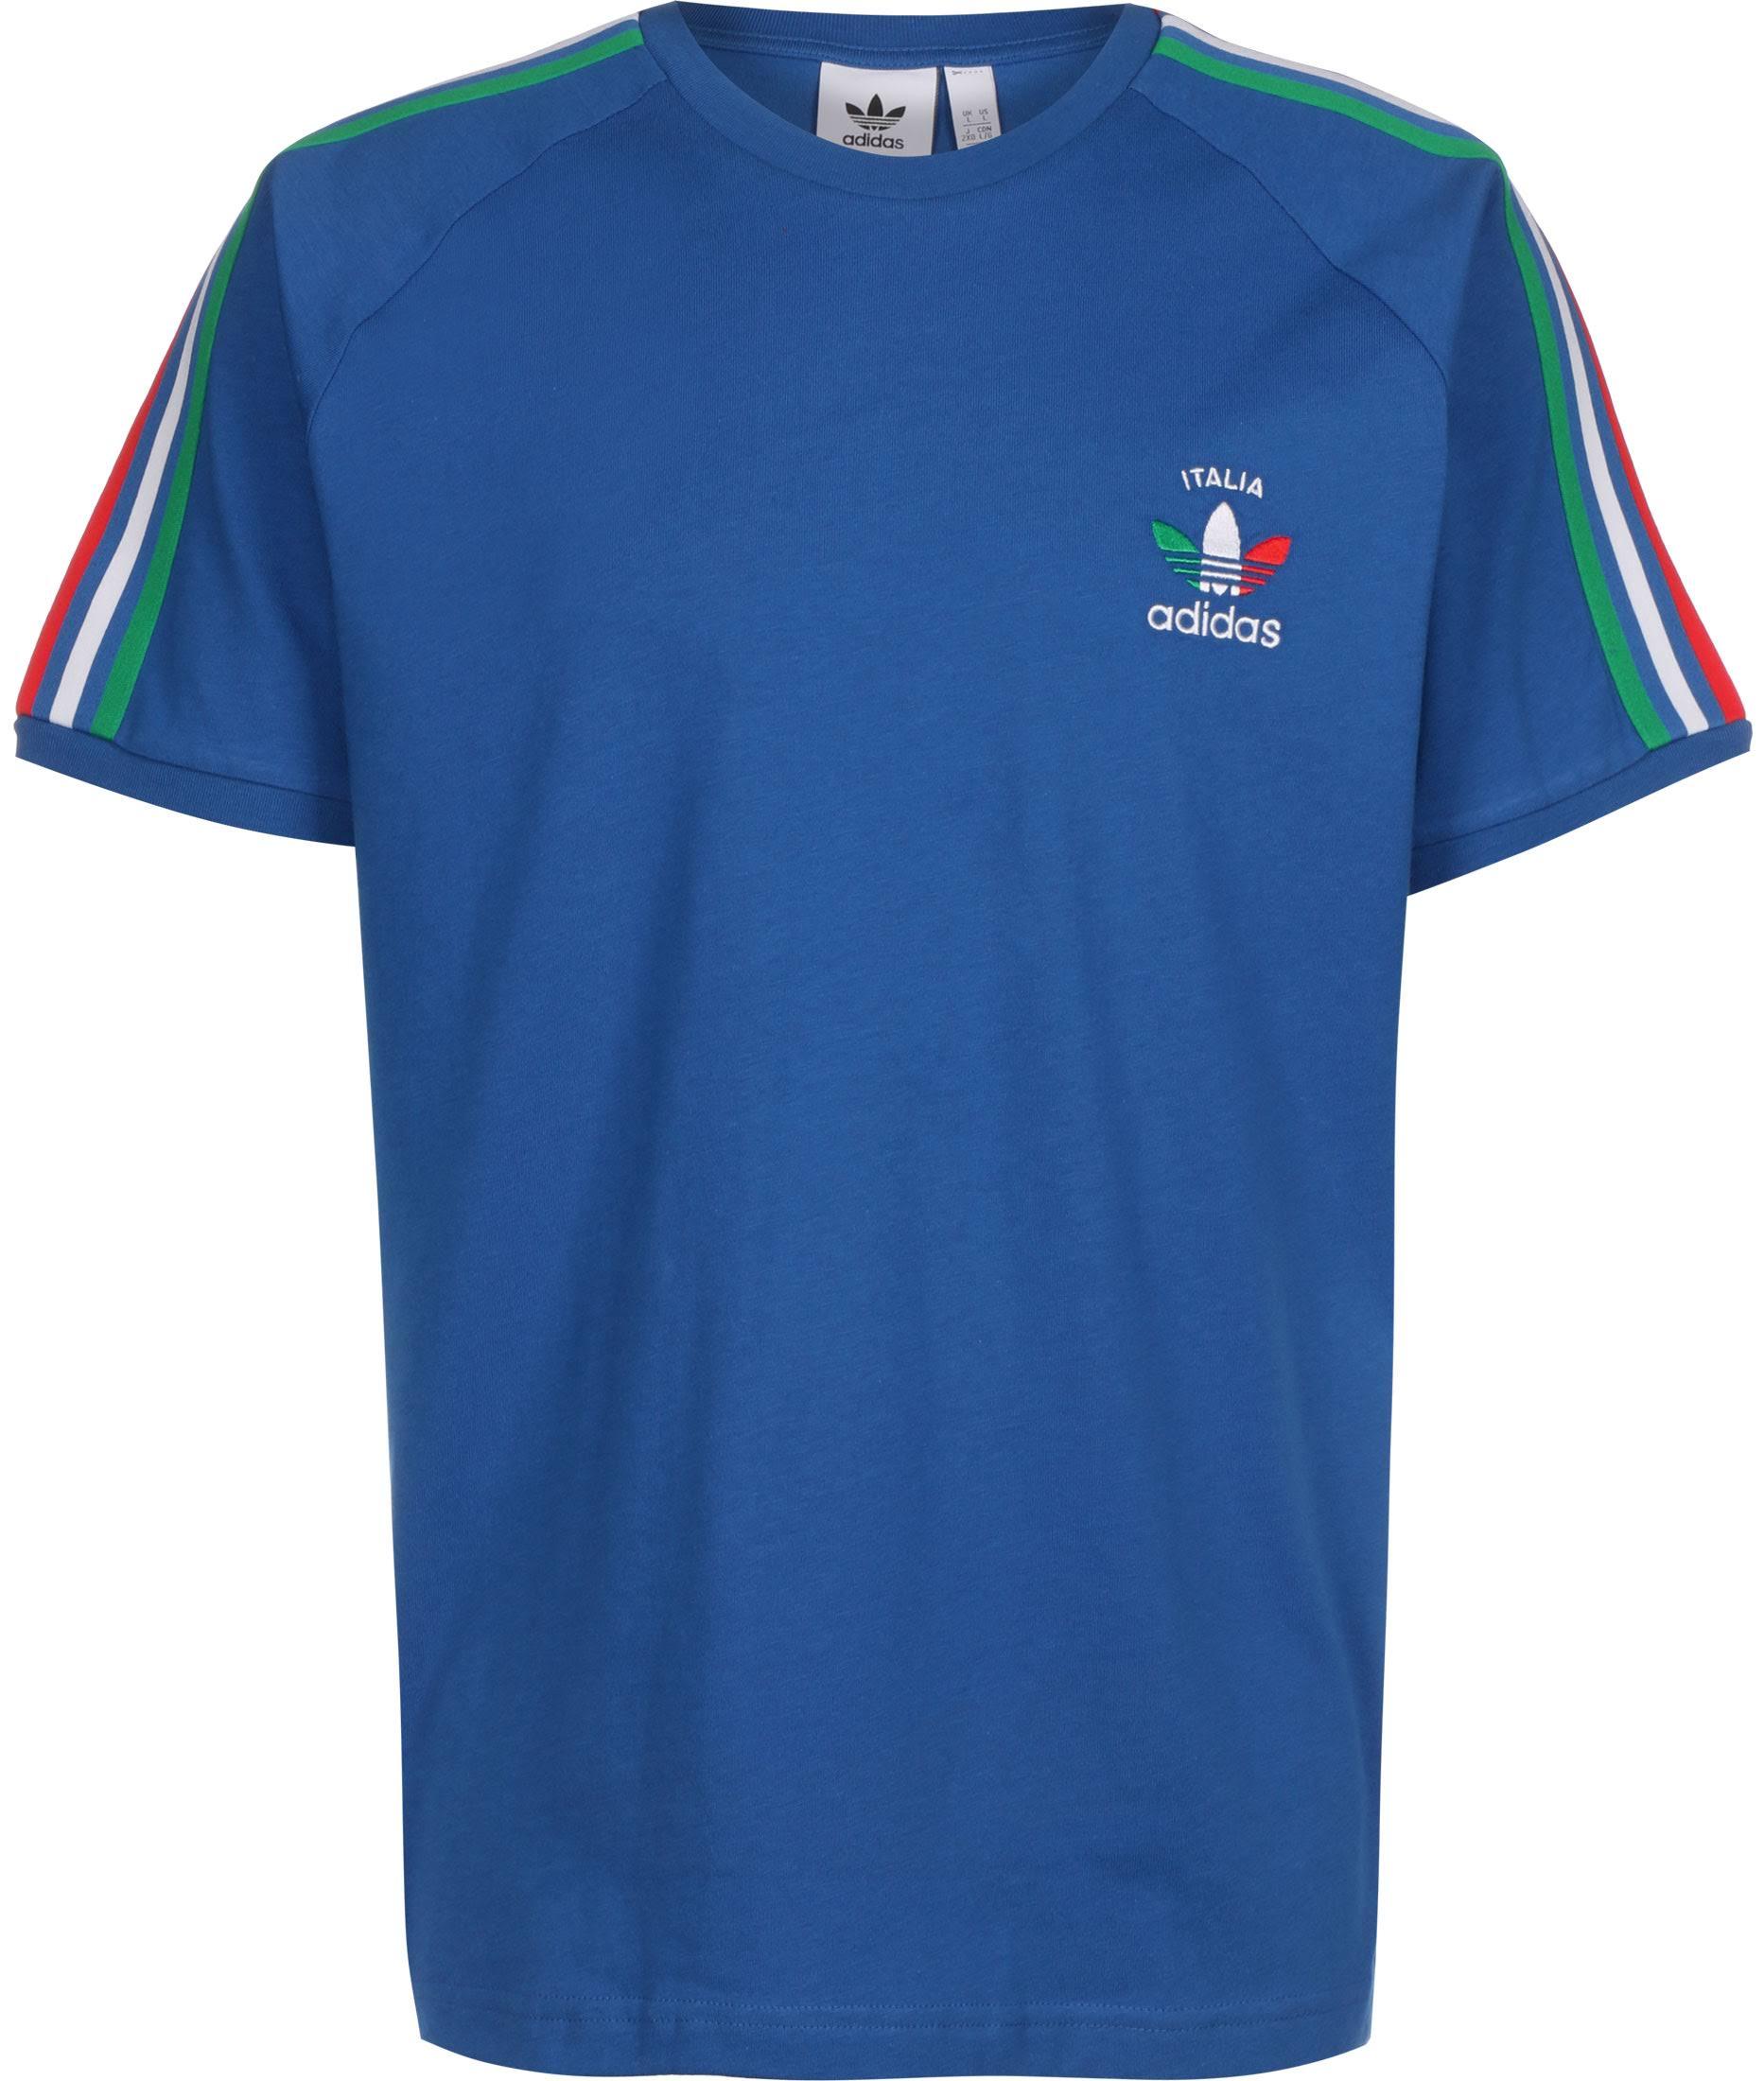 Adidas Originals 3 Stripe Italia T Shirt Blue